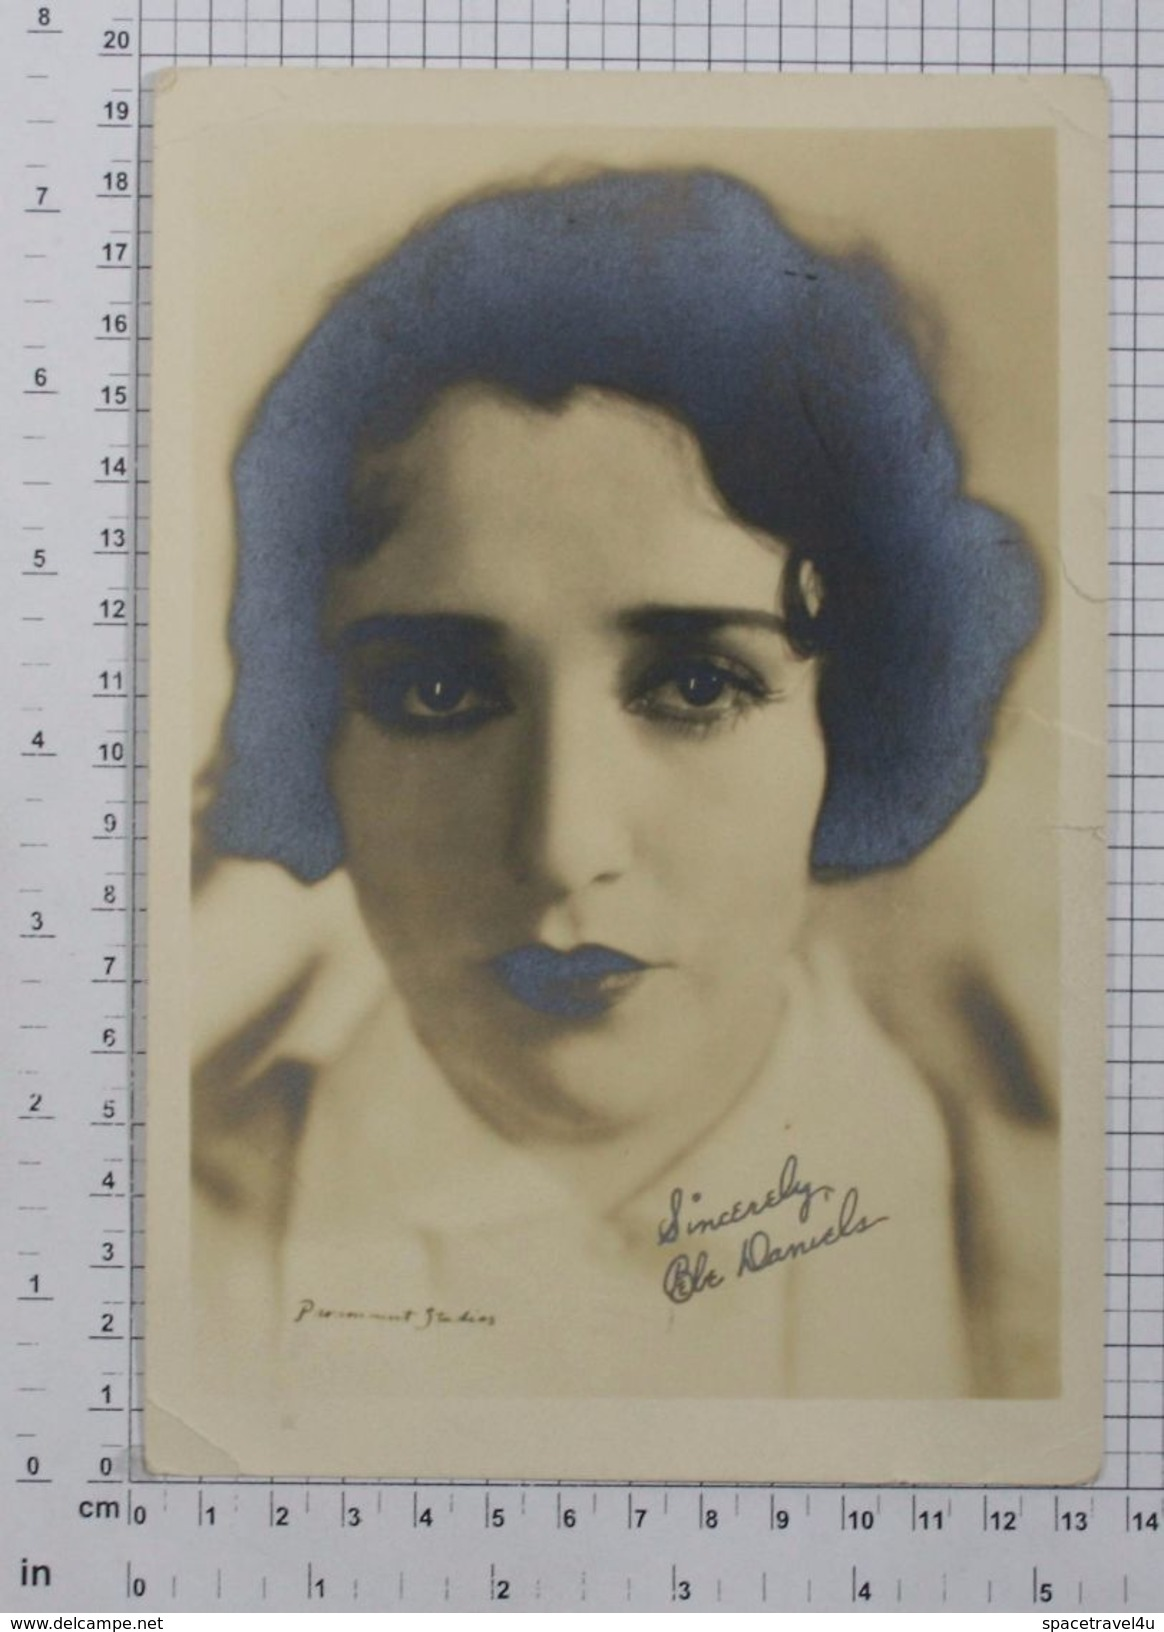 BEBE DANIELS - Vintage PHOTO Autograph REPRINT (SF-06) - Reproductions